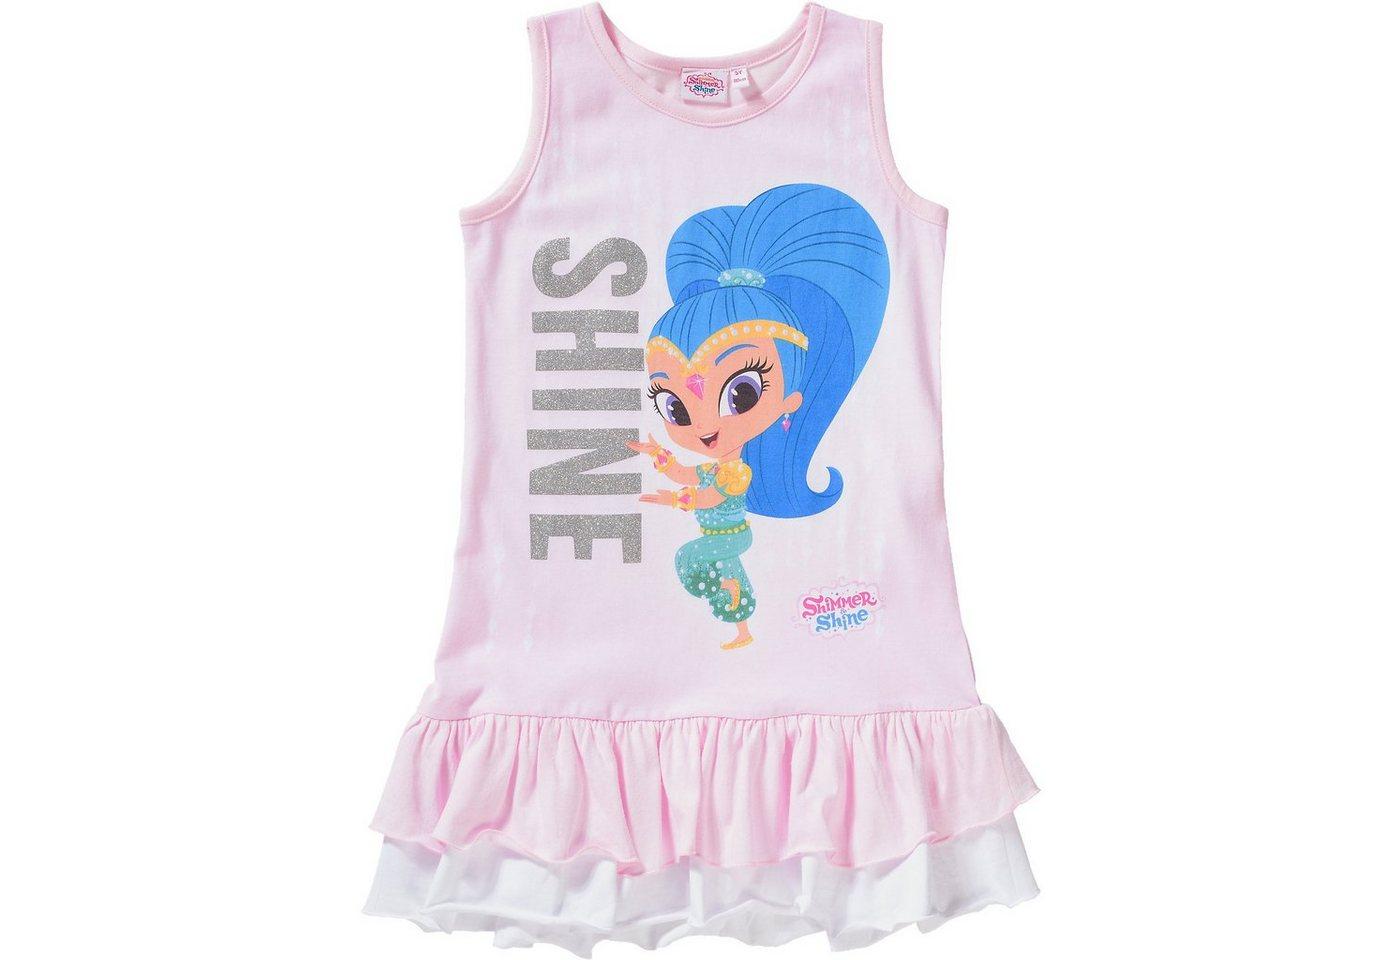 otto - Shimmer and Shine Kinder Jerseykleid